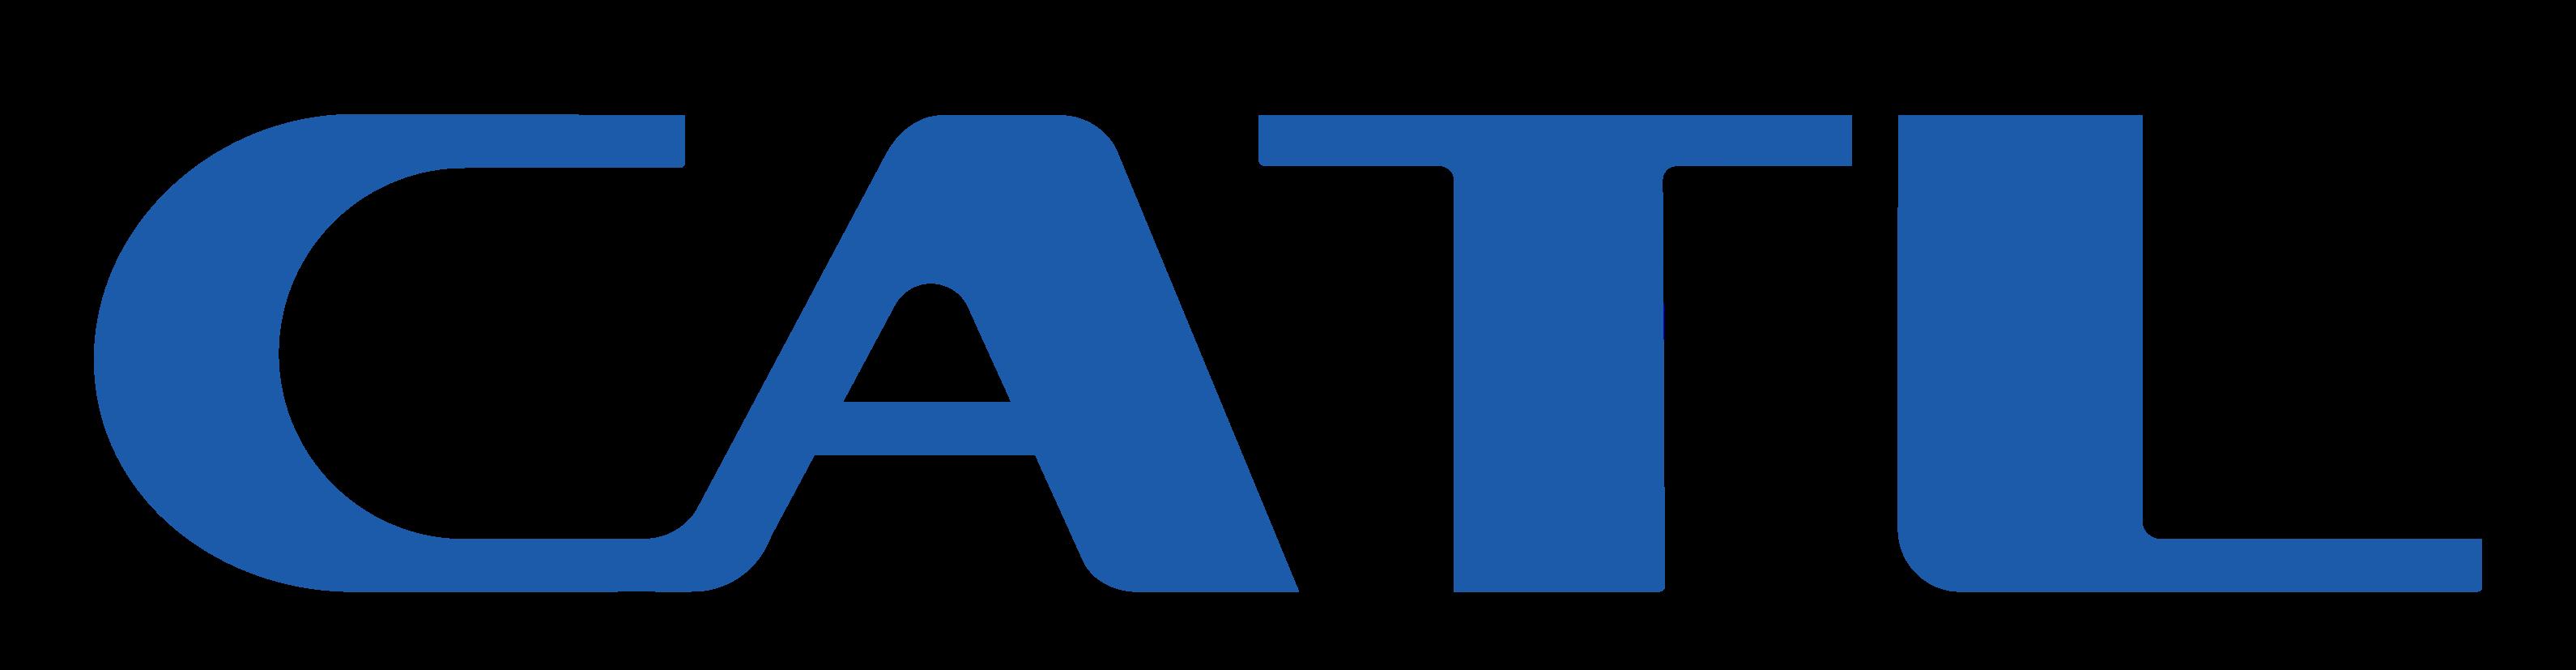 Contemporary Amperex Technology Ltd. Aktie